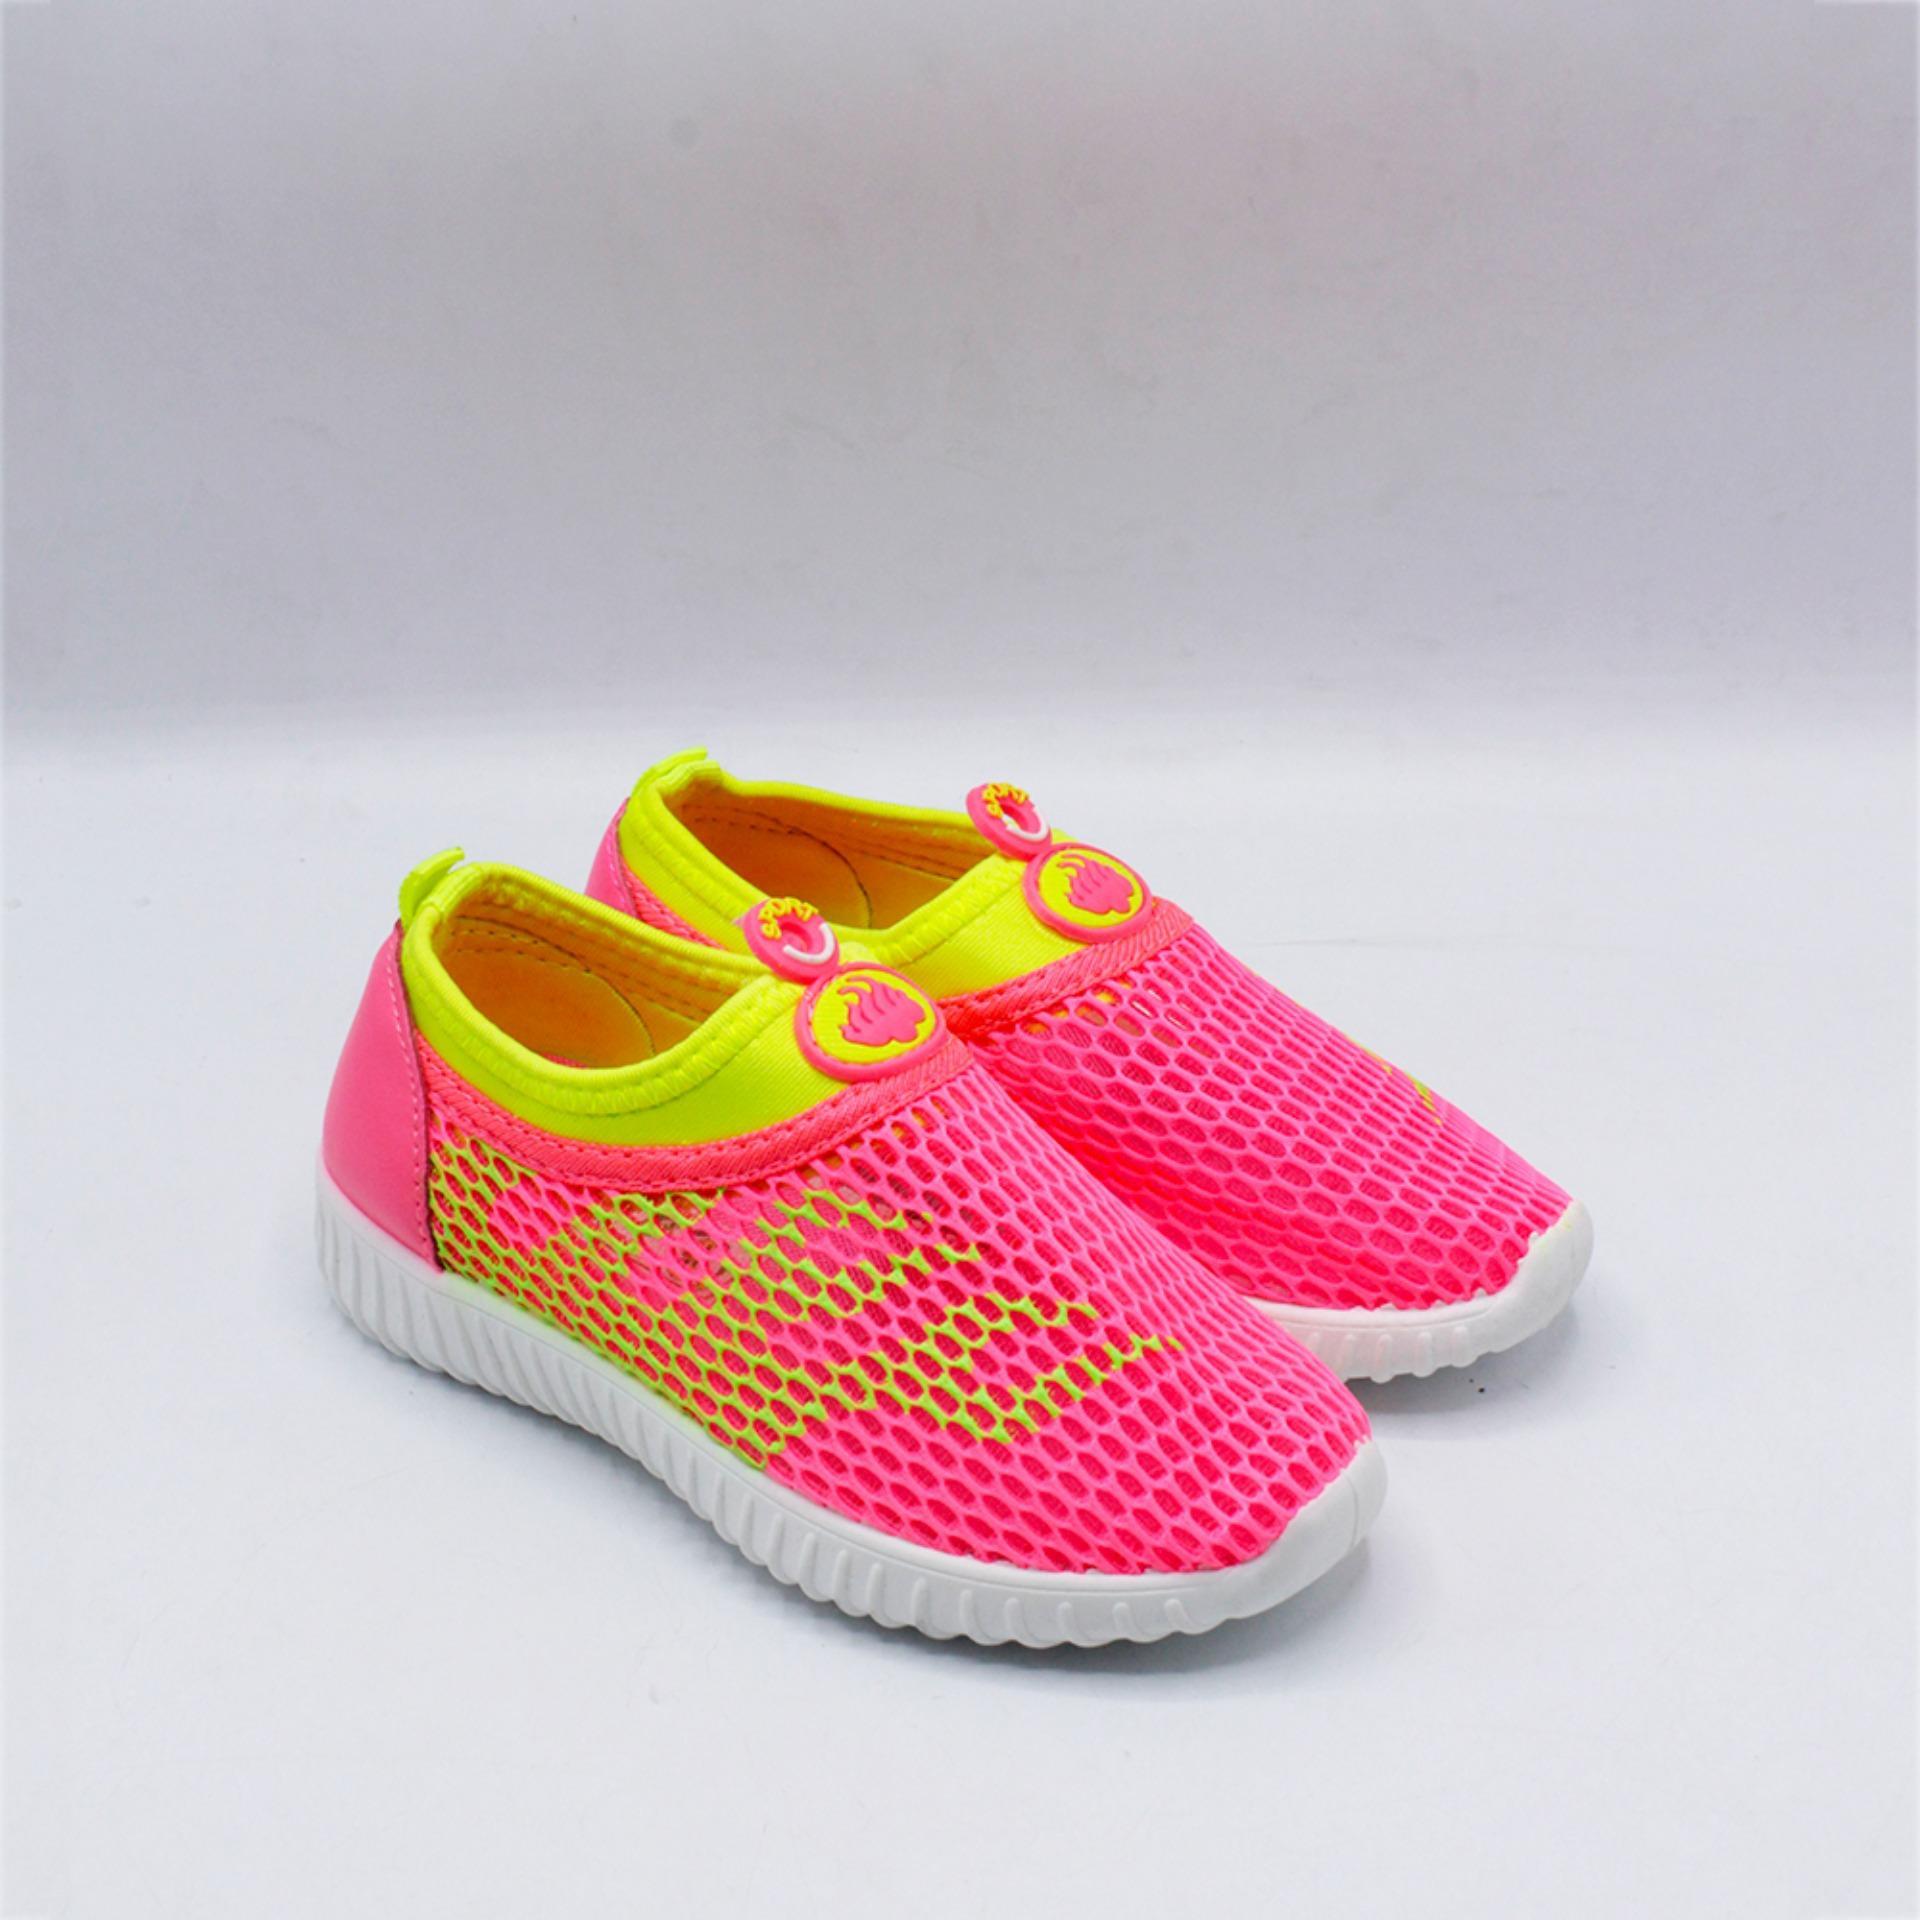 Cek Harga Baru Sport Sepatu Sneakers Anak 1604 264 A6 Peach Size 16 Sandal Laki 306 Brown 26 31 1608 07 36